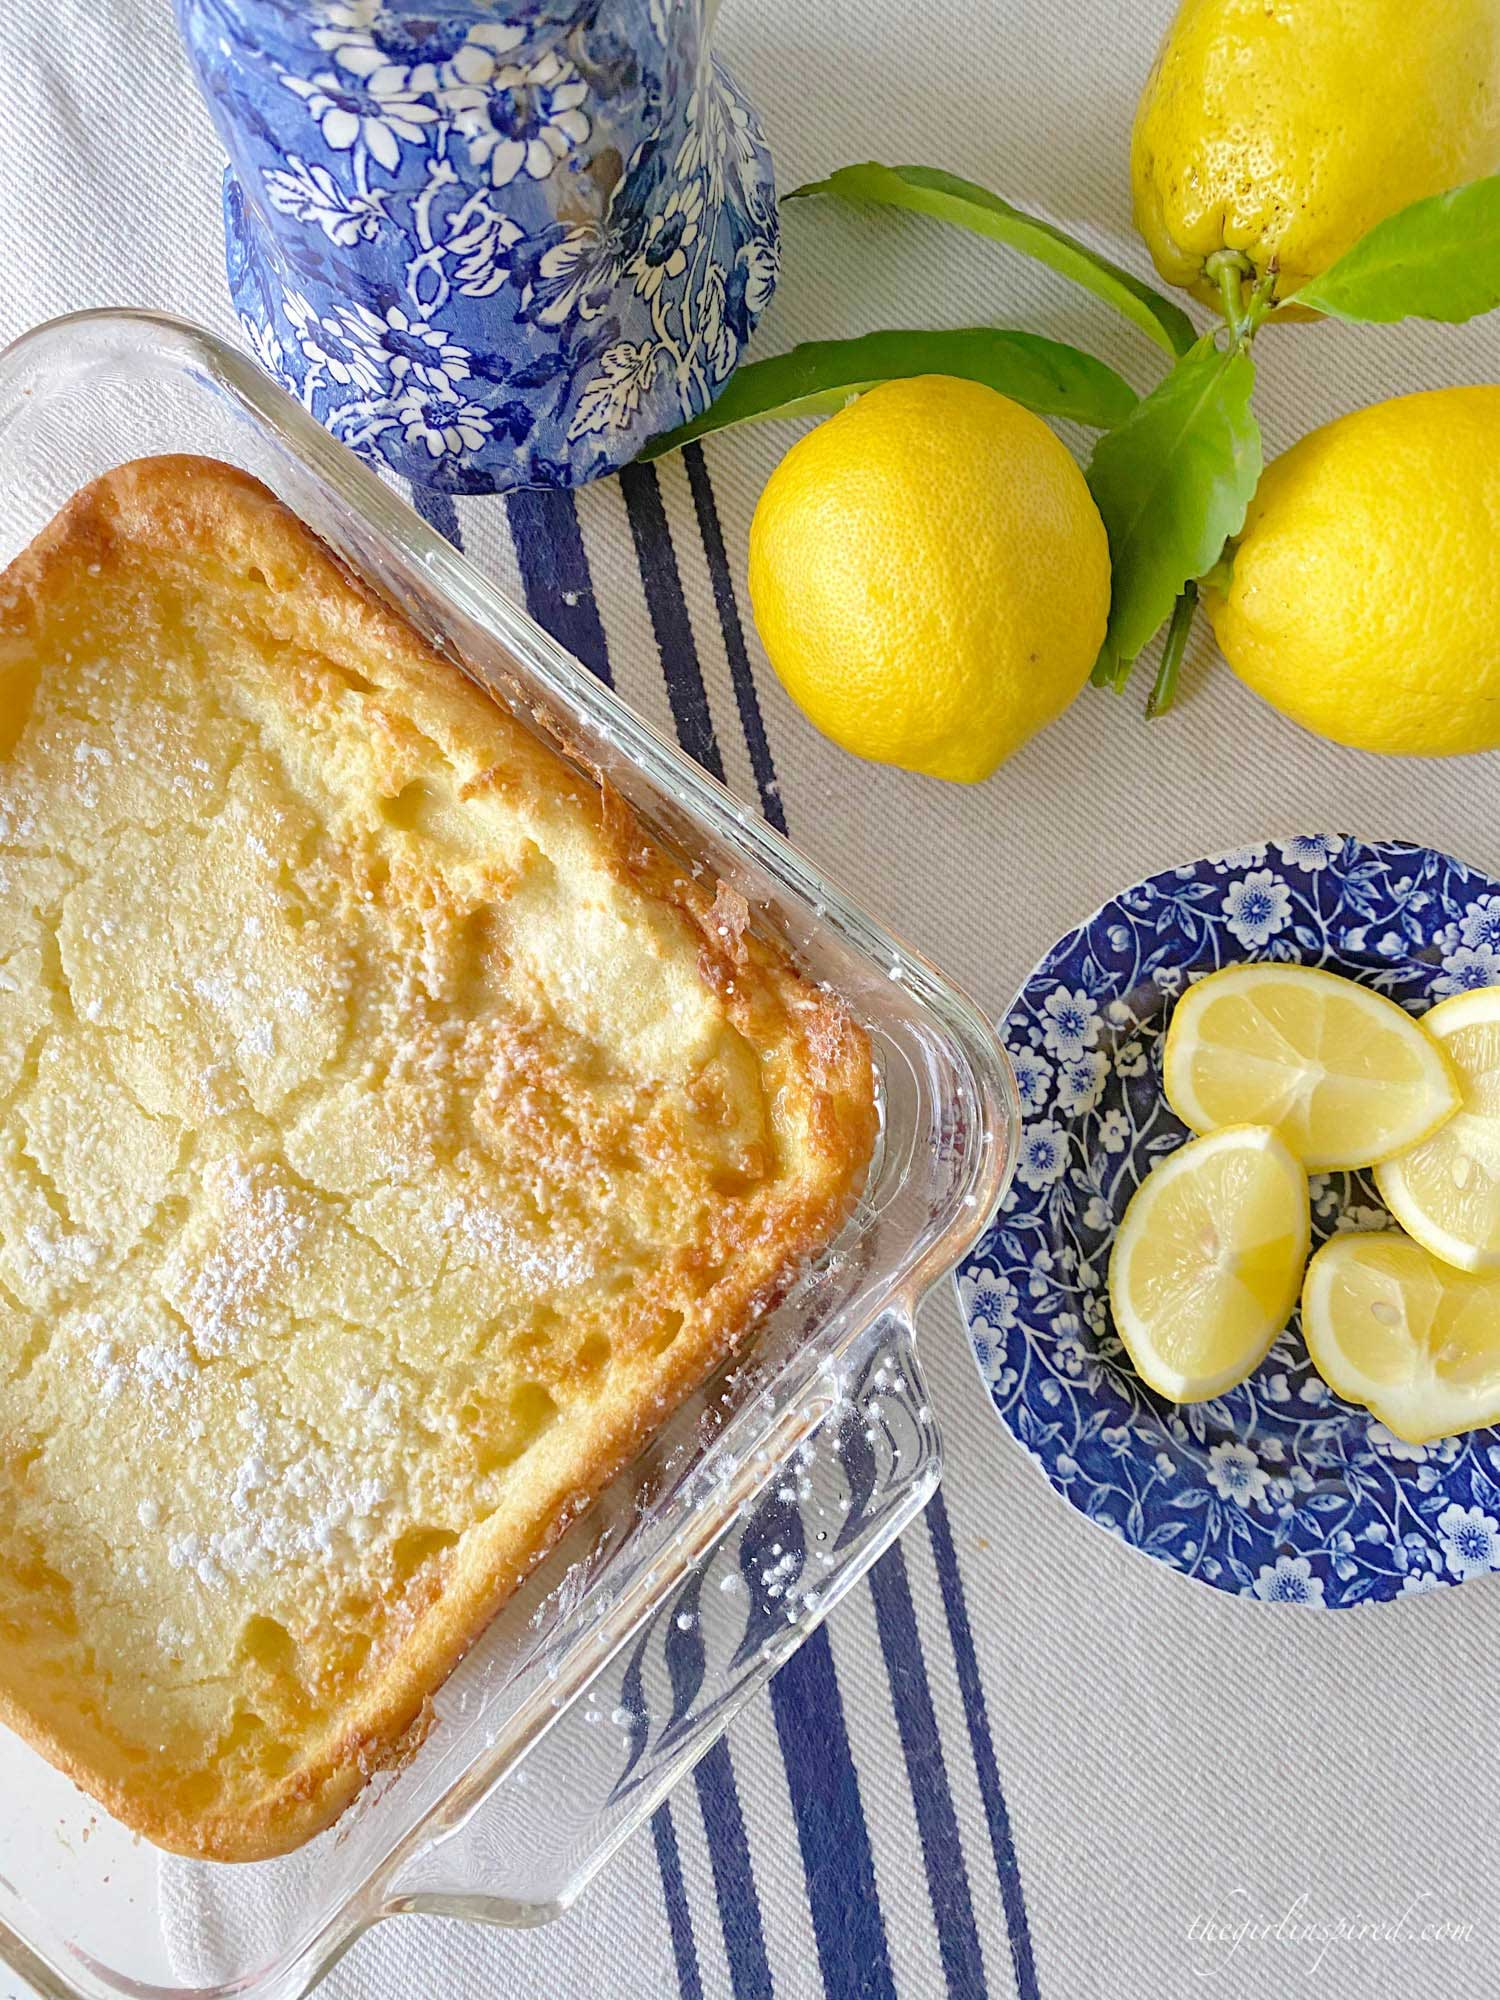 German pancake, lemons, lemon slices and blue plate